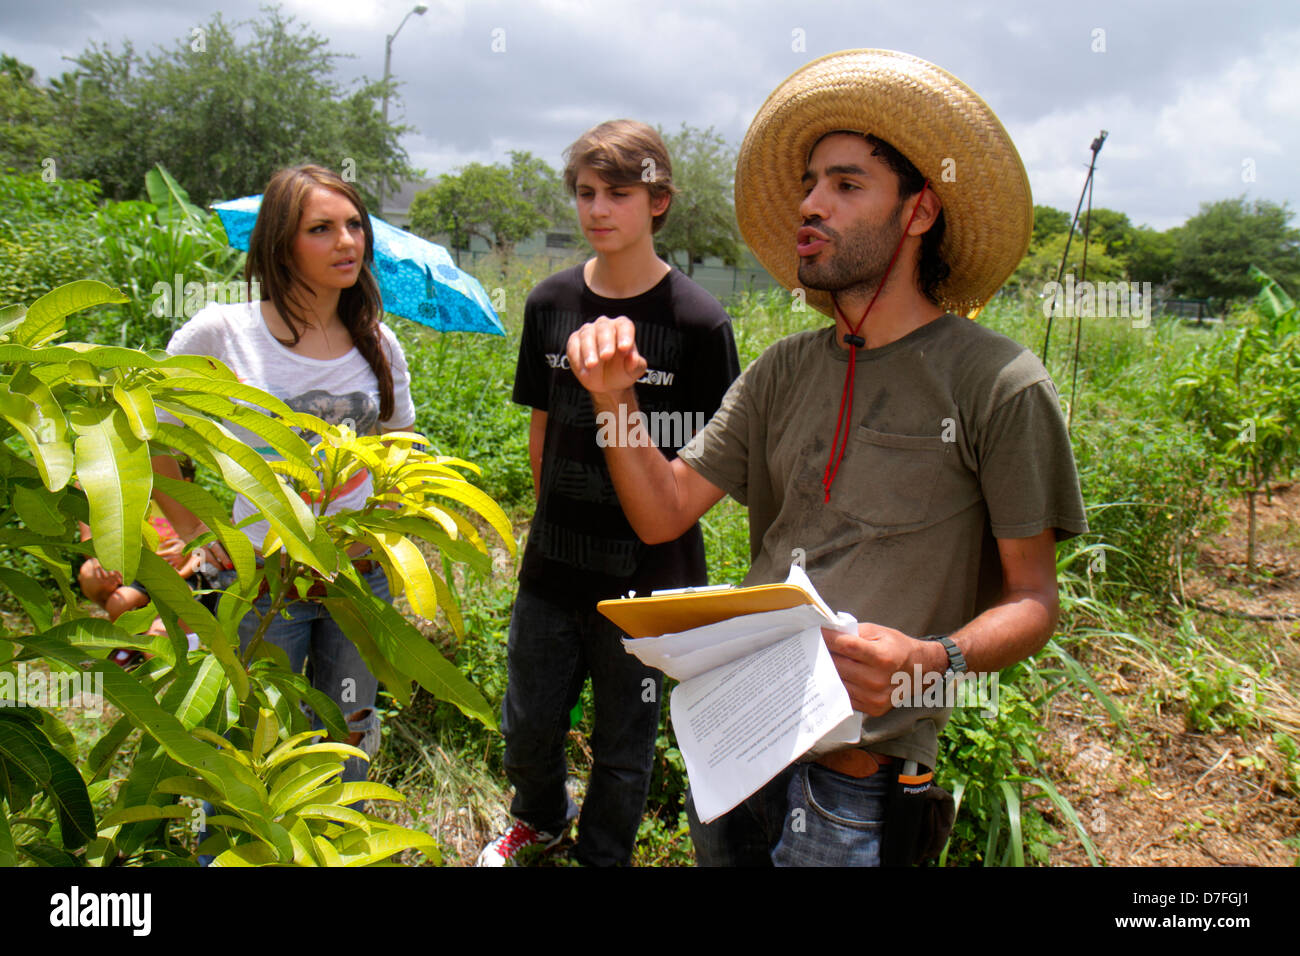 Miami Homestead Florida Harvest Farmers Market at Verde Gardens Hispanic man guide explaining organic growing farm - Stock Image